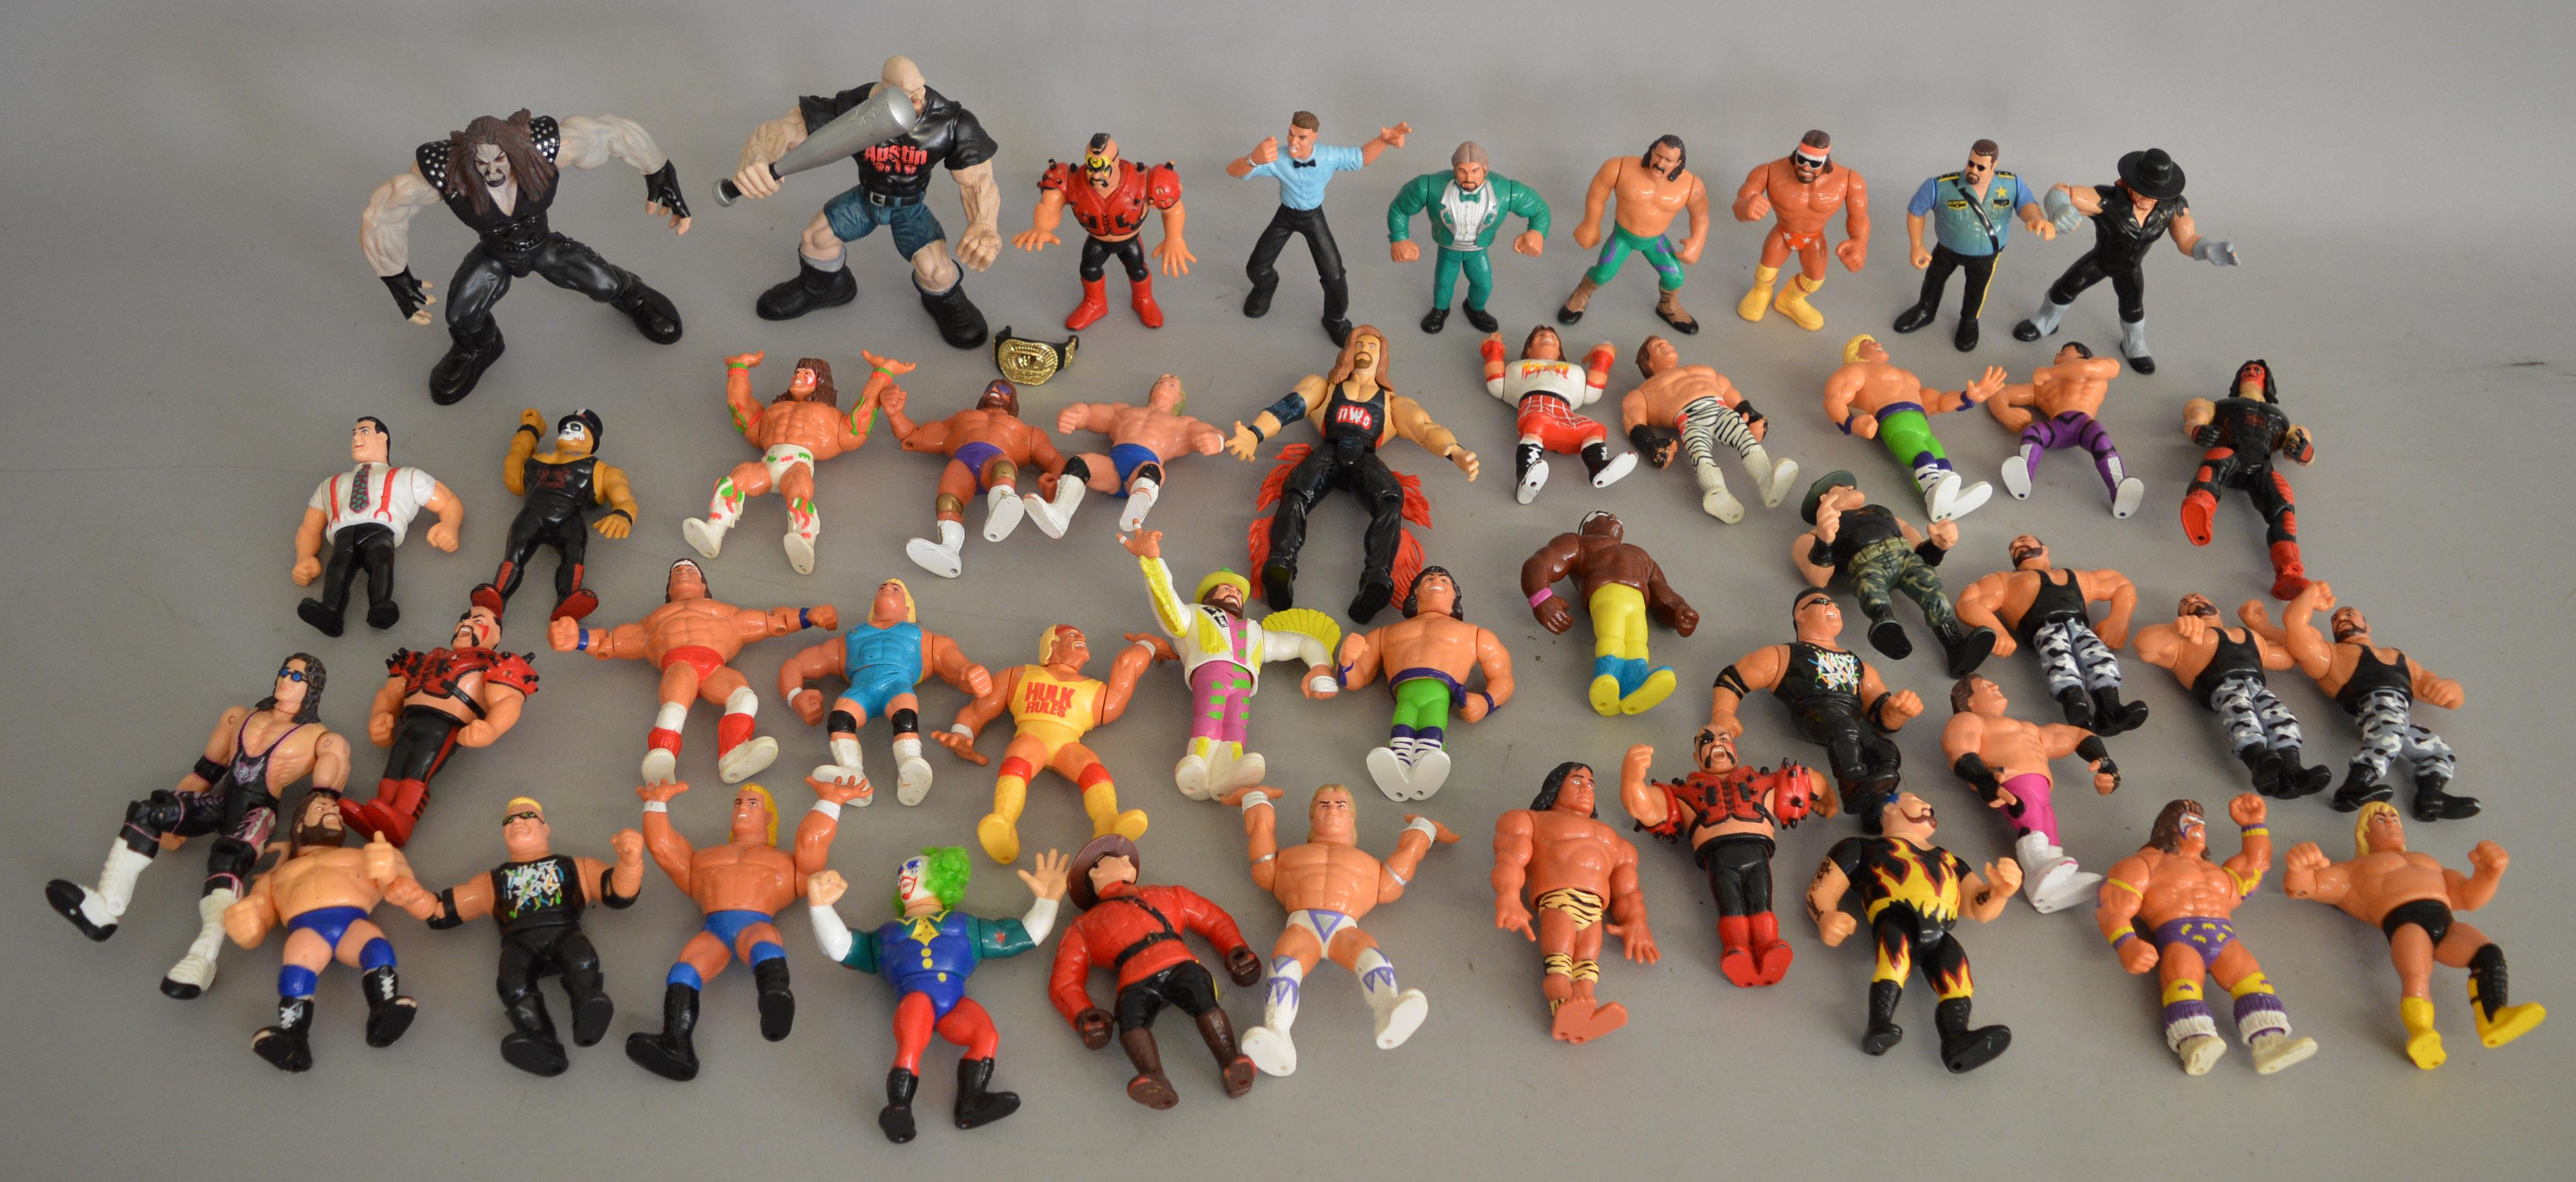 Lot 623 - Agood quantity of Wrestling Figures, WWE/ WWF/ WCW